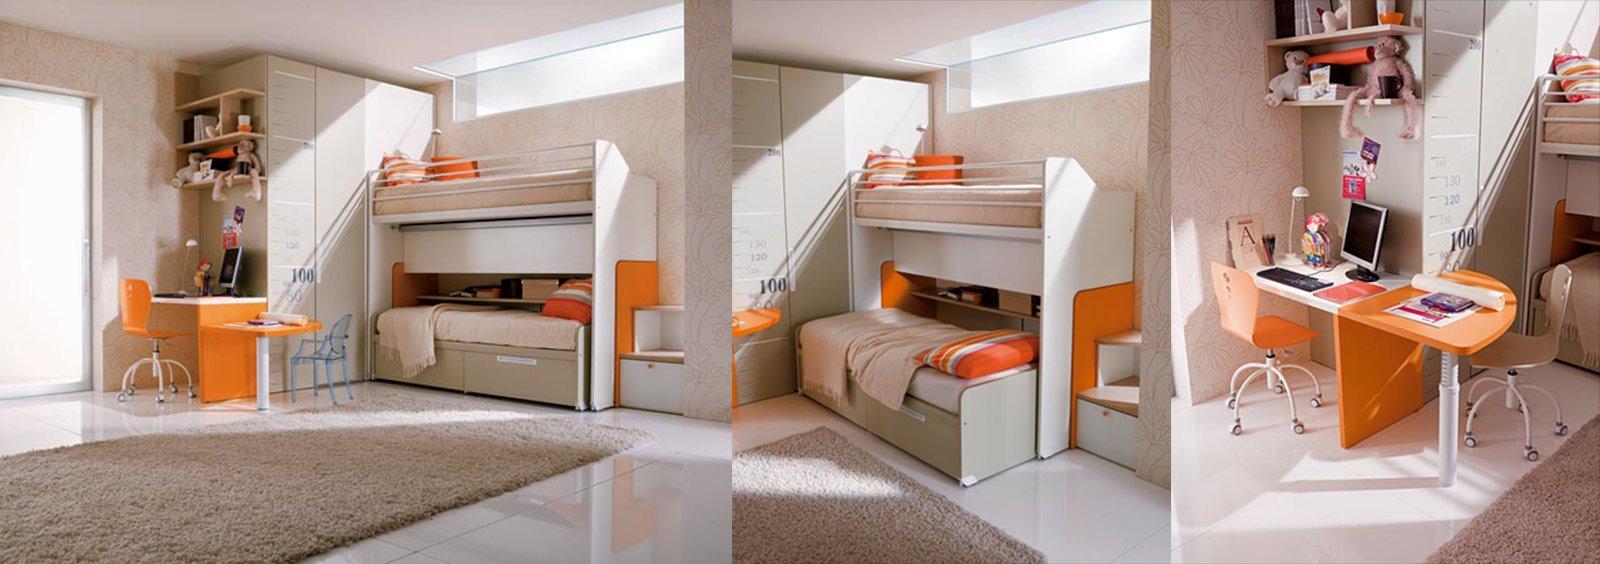 Camerette salvaspazio cose di casa - Soluzioni per camerette ...